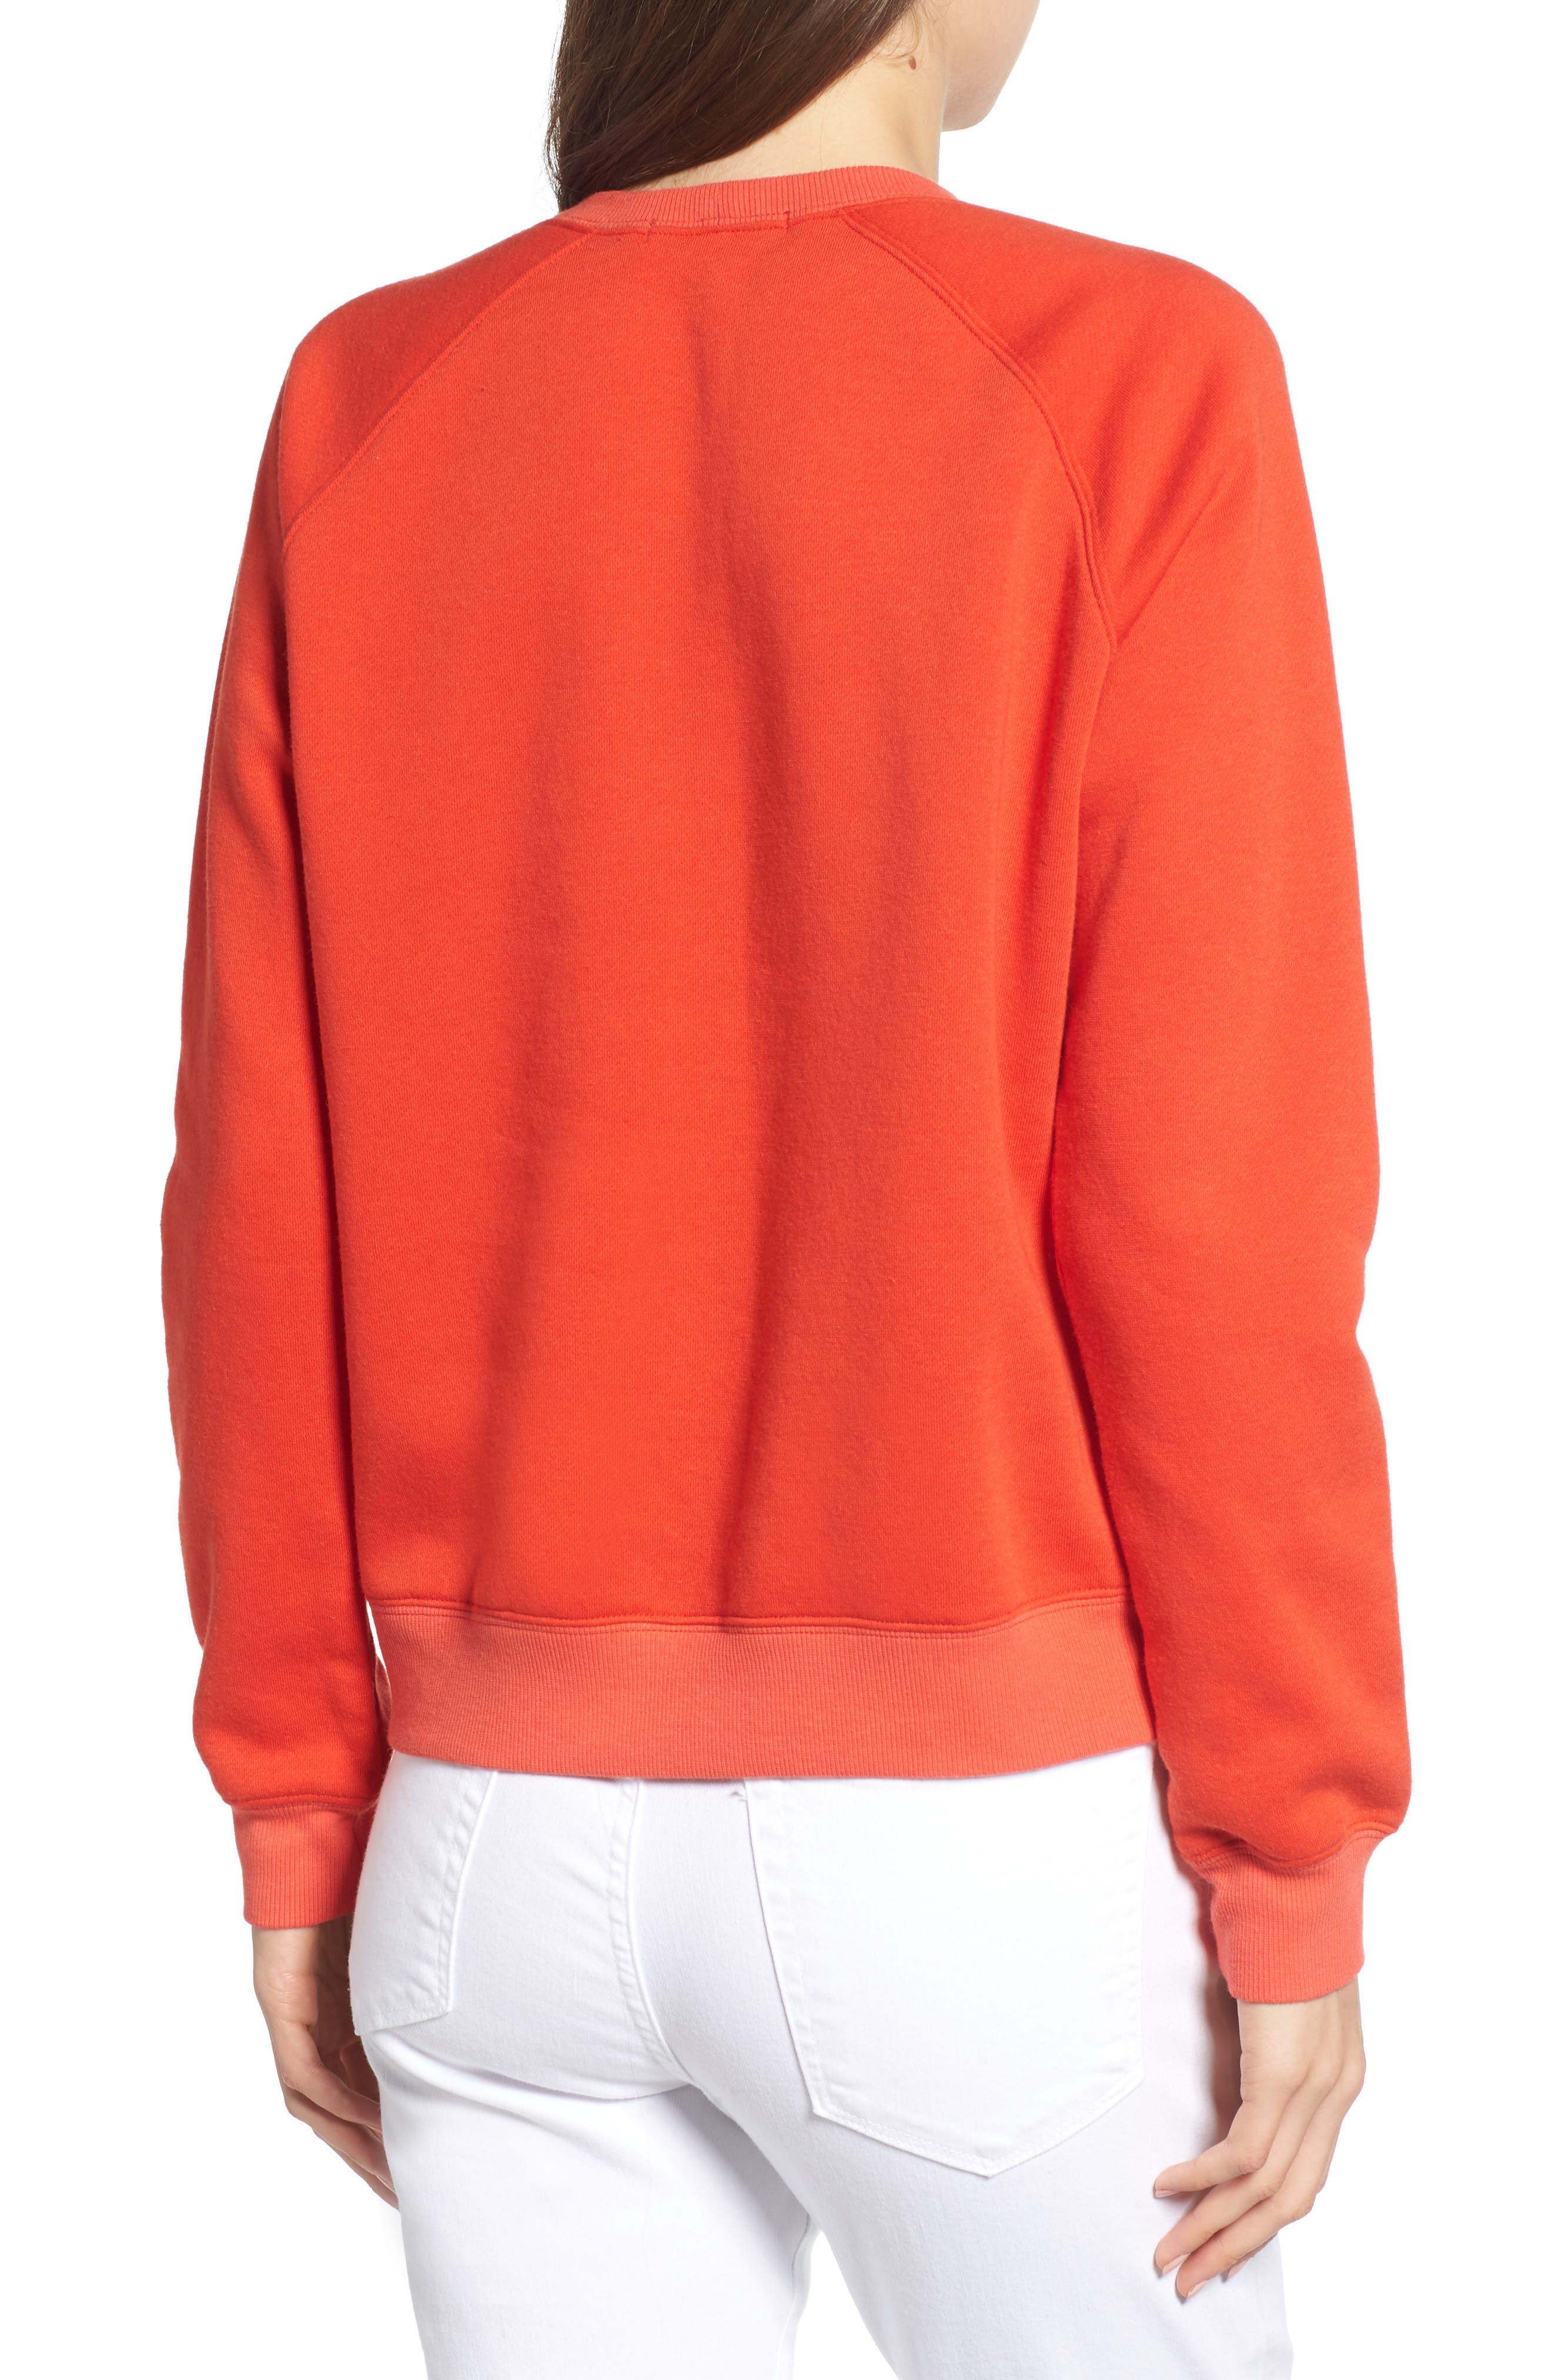 No Bad Days Sweatshirt,                             Alternate thumbnail 2, color,                             607